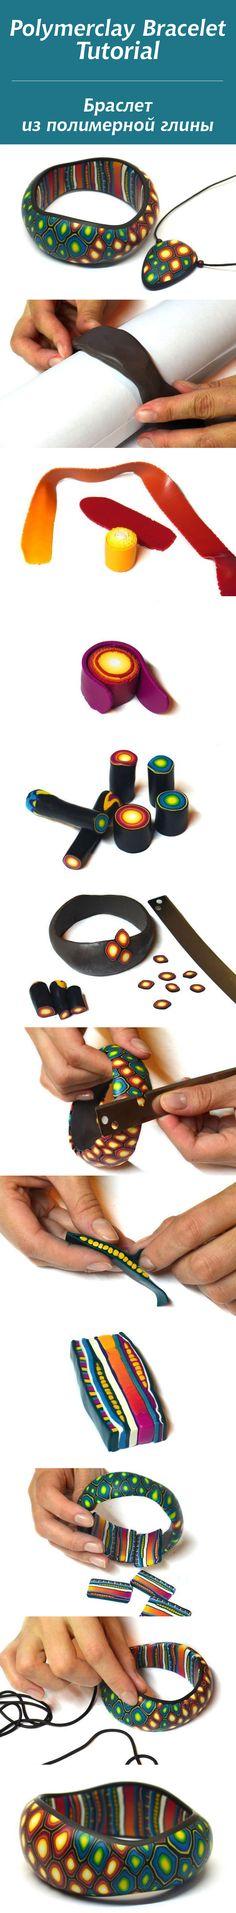 Polymer clay bracelet tutorial with canes Polymer Clay Bracelet, Polymer Clay Canes, Fimo Clay, Polymer Clay Projects, Polymer Clay Creations, Clay Crafts, Clay Design, Bijoux Diy, Clay Tutorials